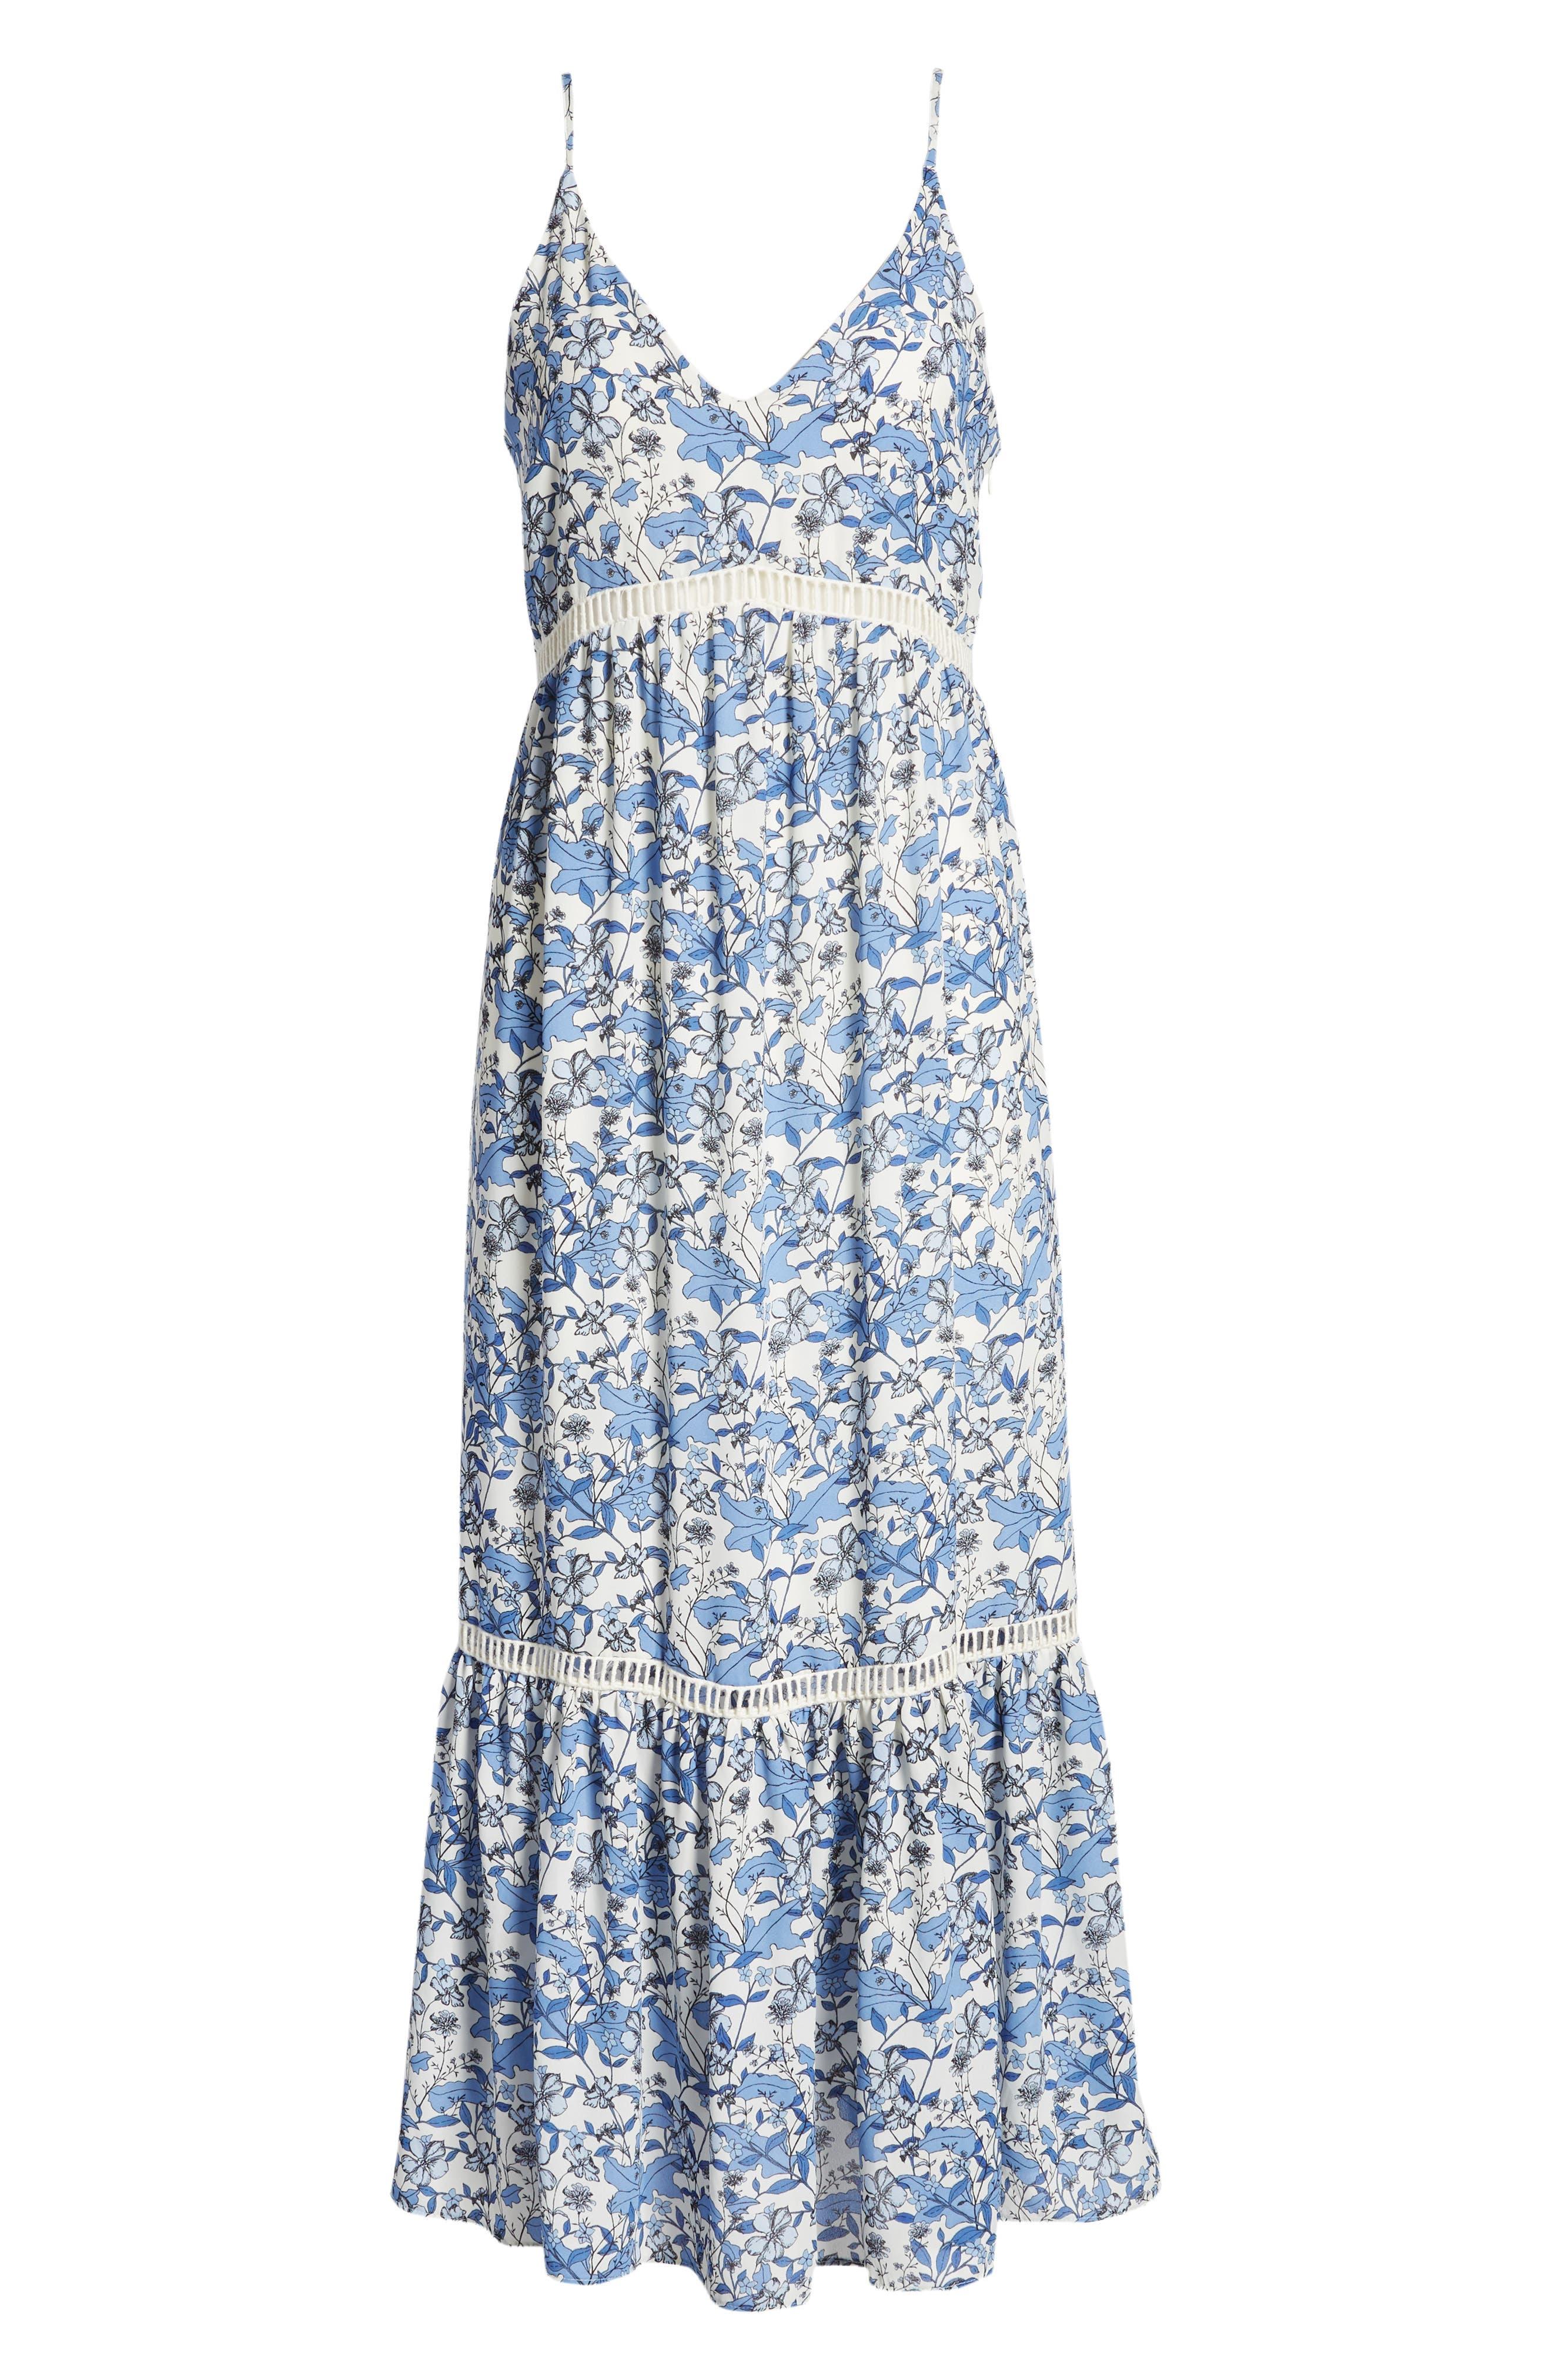 Ivy Forest Maxi Dress,                             Alternate thumbnail 7, color,                             Antique White